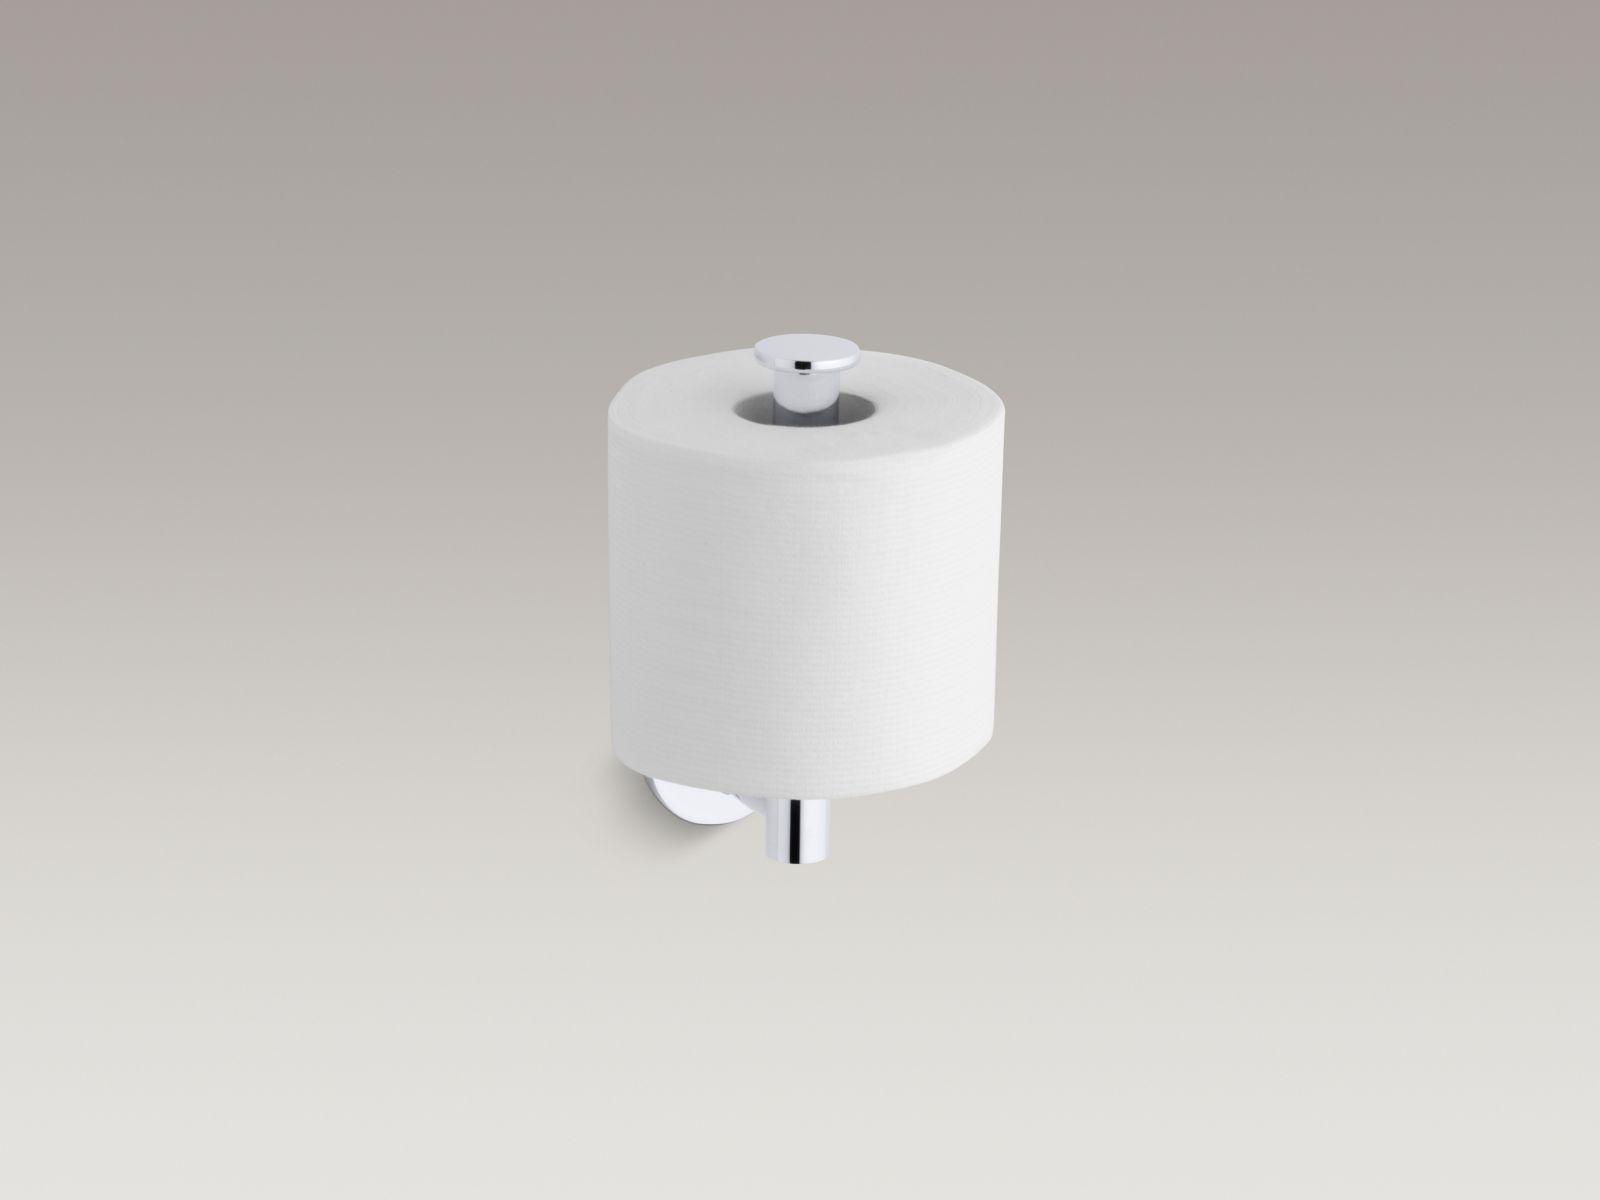 Kohler K-14459-CP Stillness Vertical Toilet Paper Holder Polished Chrome